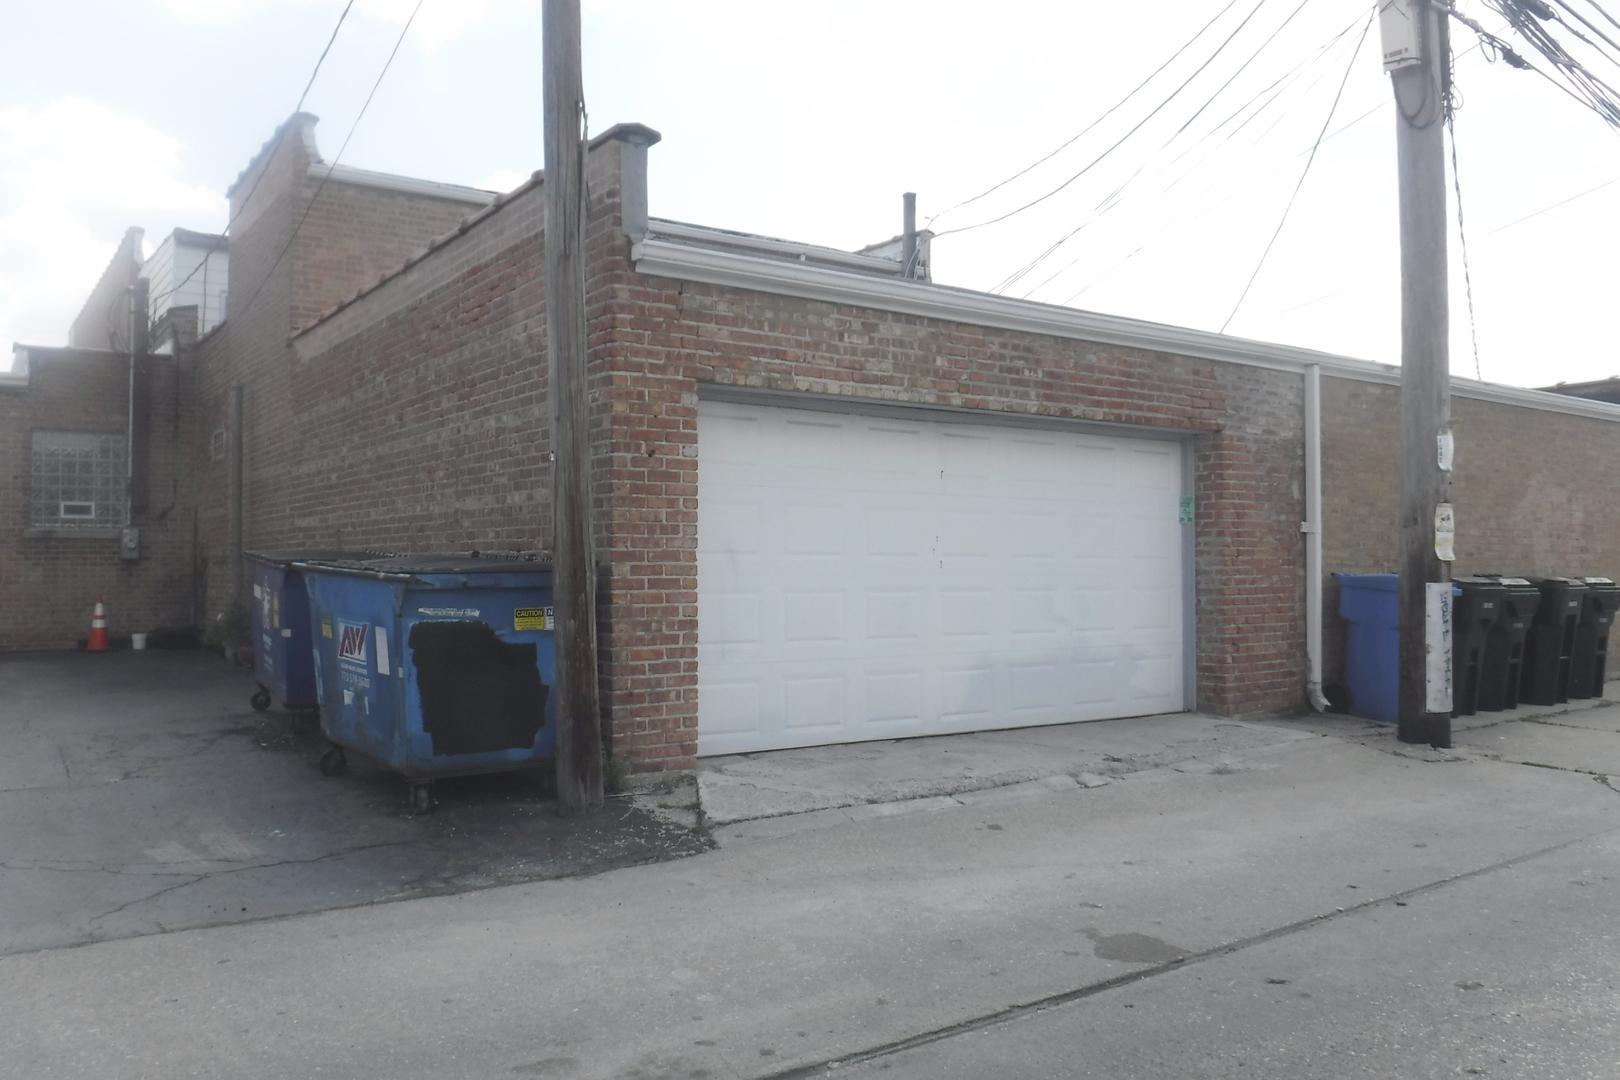 5712 Pulaski ,Chicago, Illinois 60629